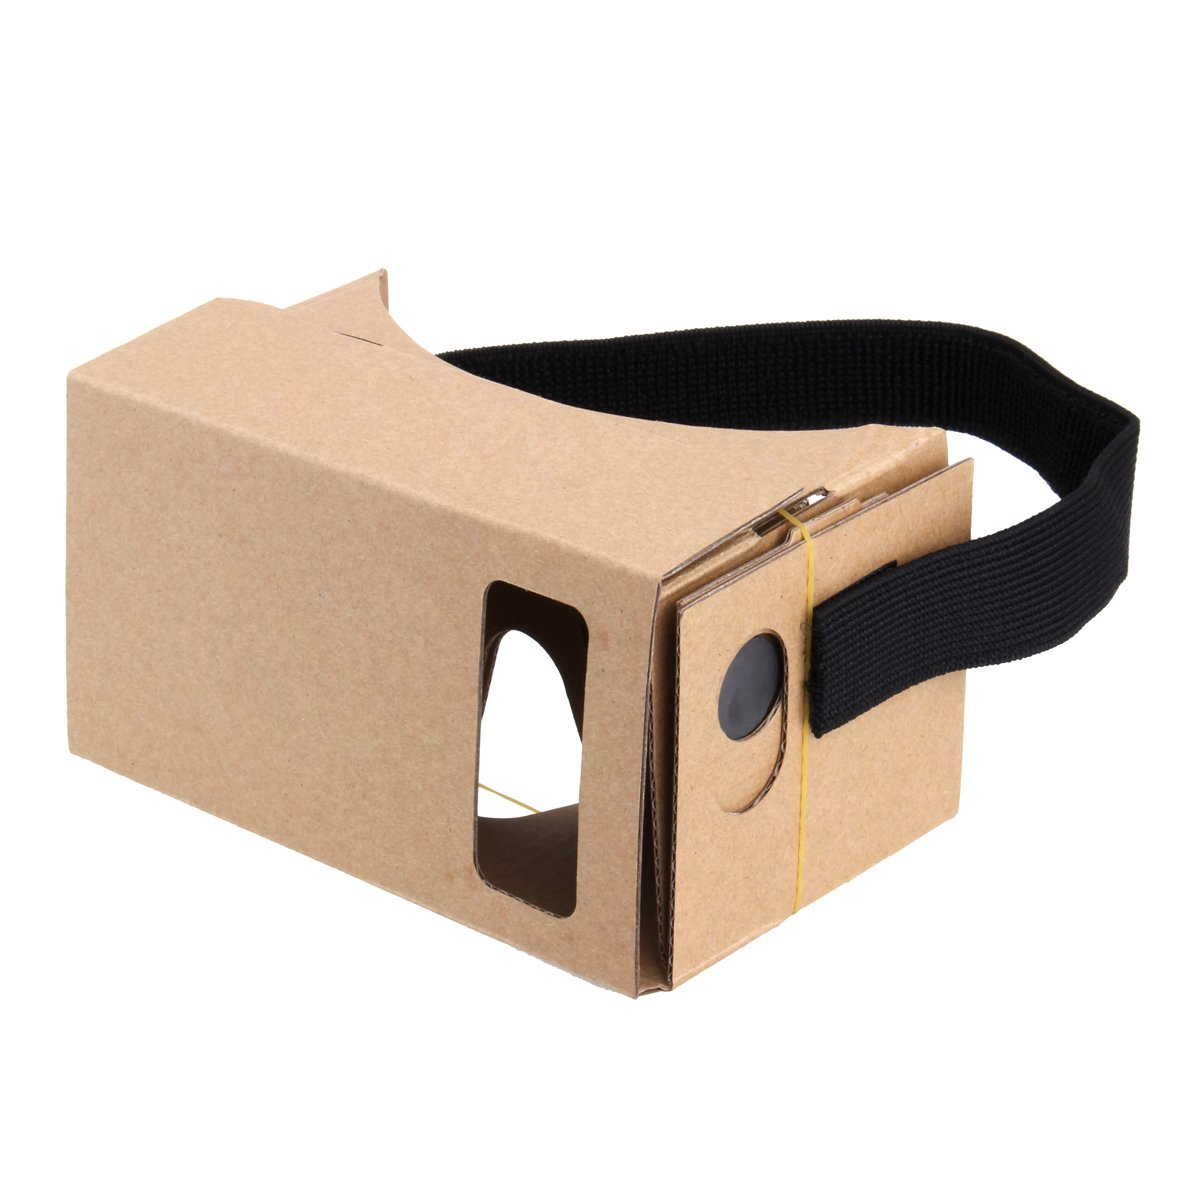 Sinbury google cardboard headset 3d virtual amazon electronics publicscrutiny Image collections